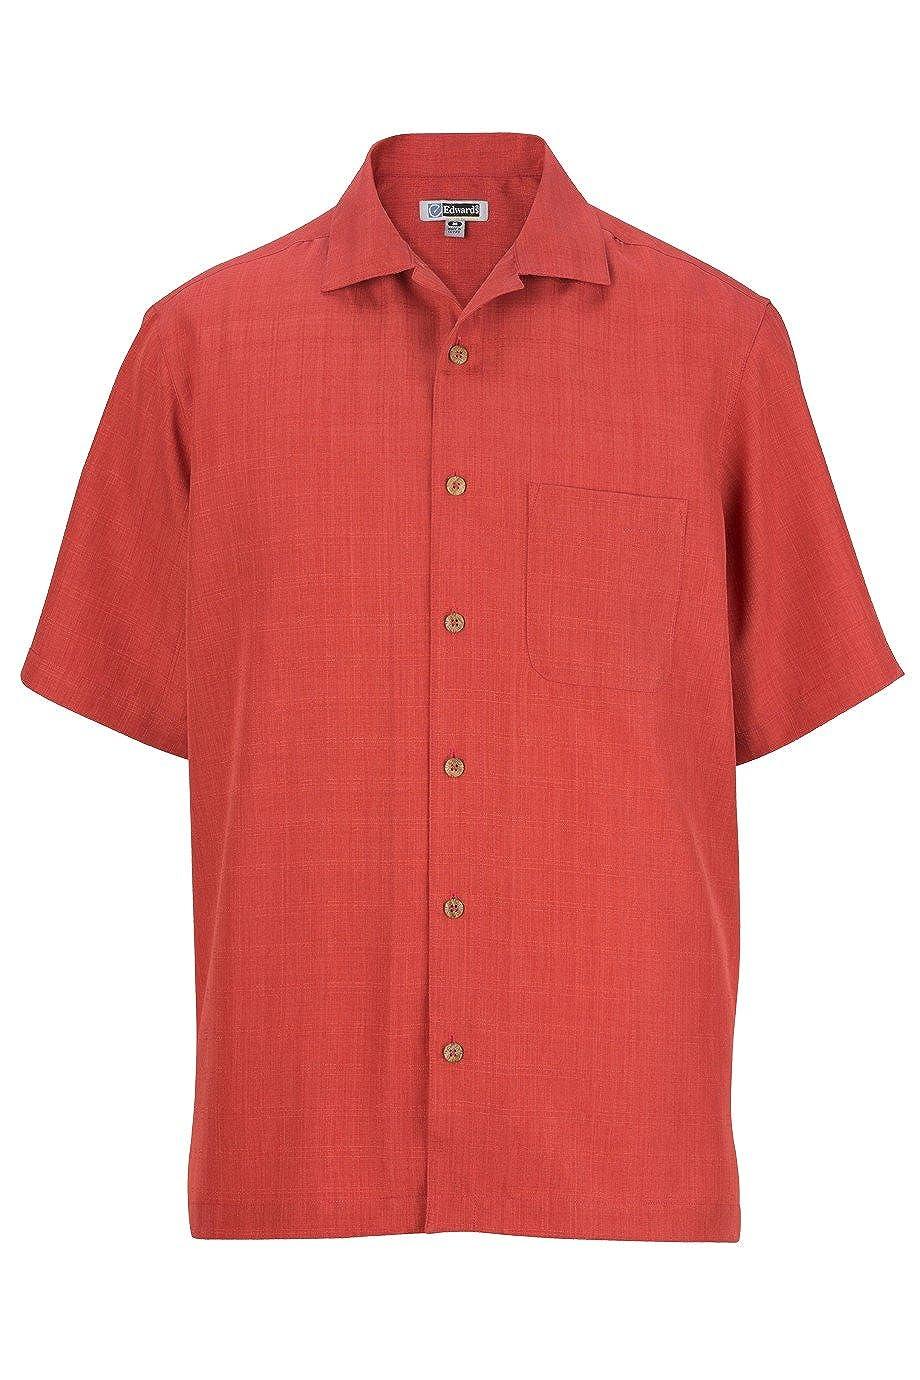 Edwards Garment Restaurants Perfect Pocket Camp Shirts/_SOFT RED/_XXS